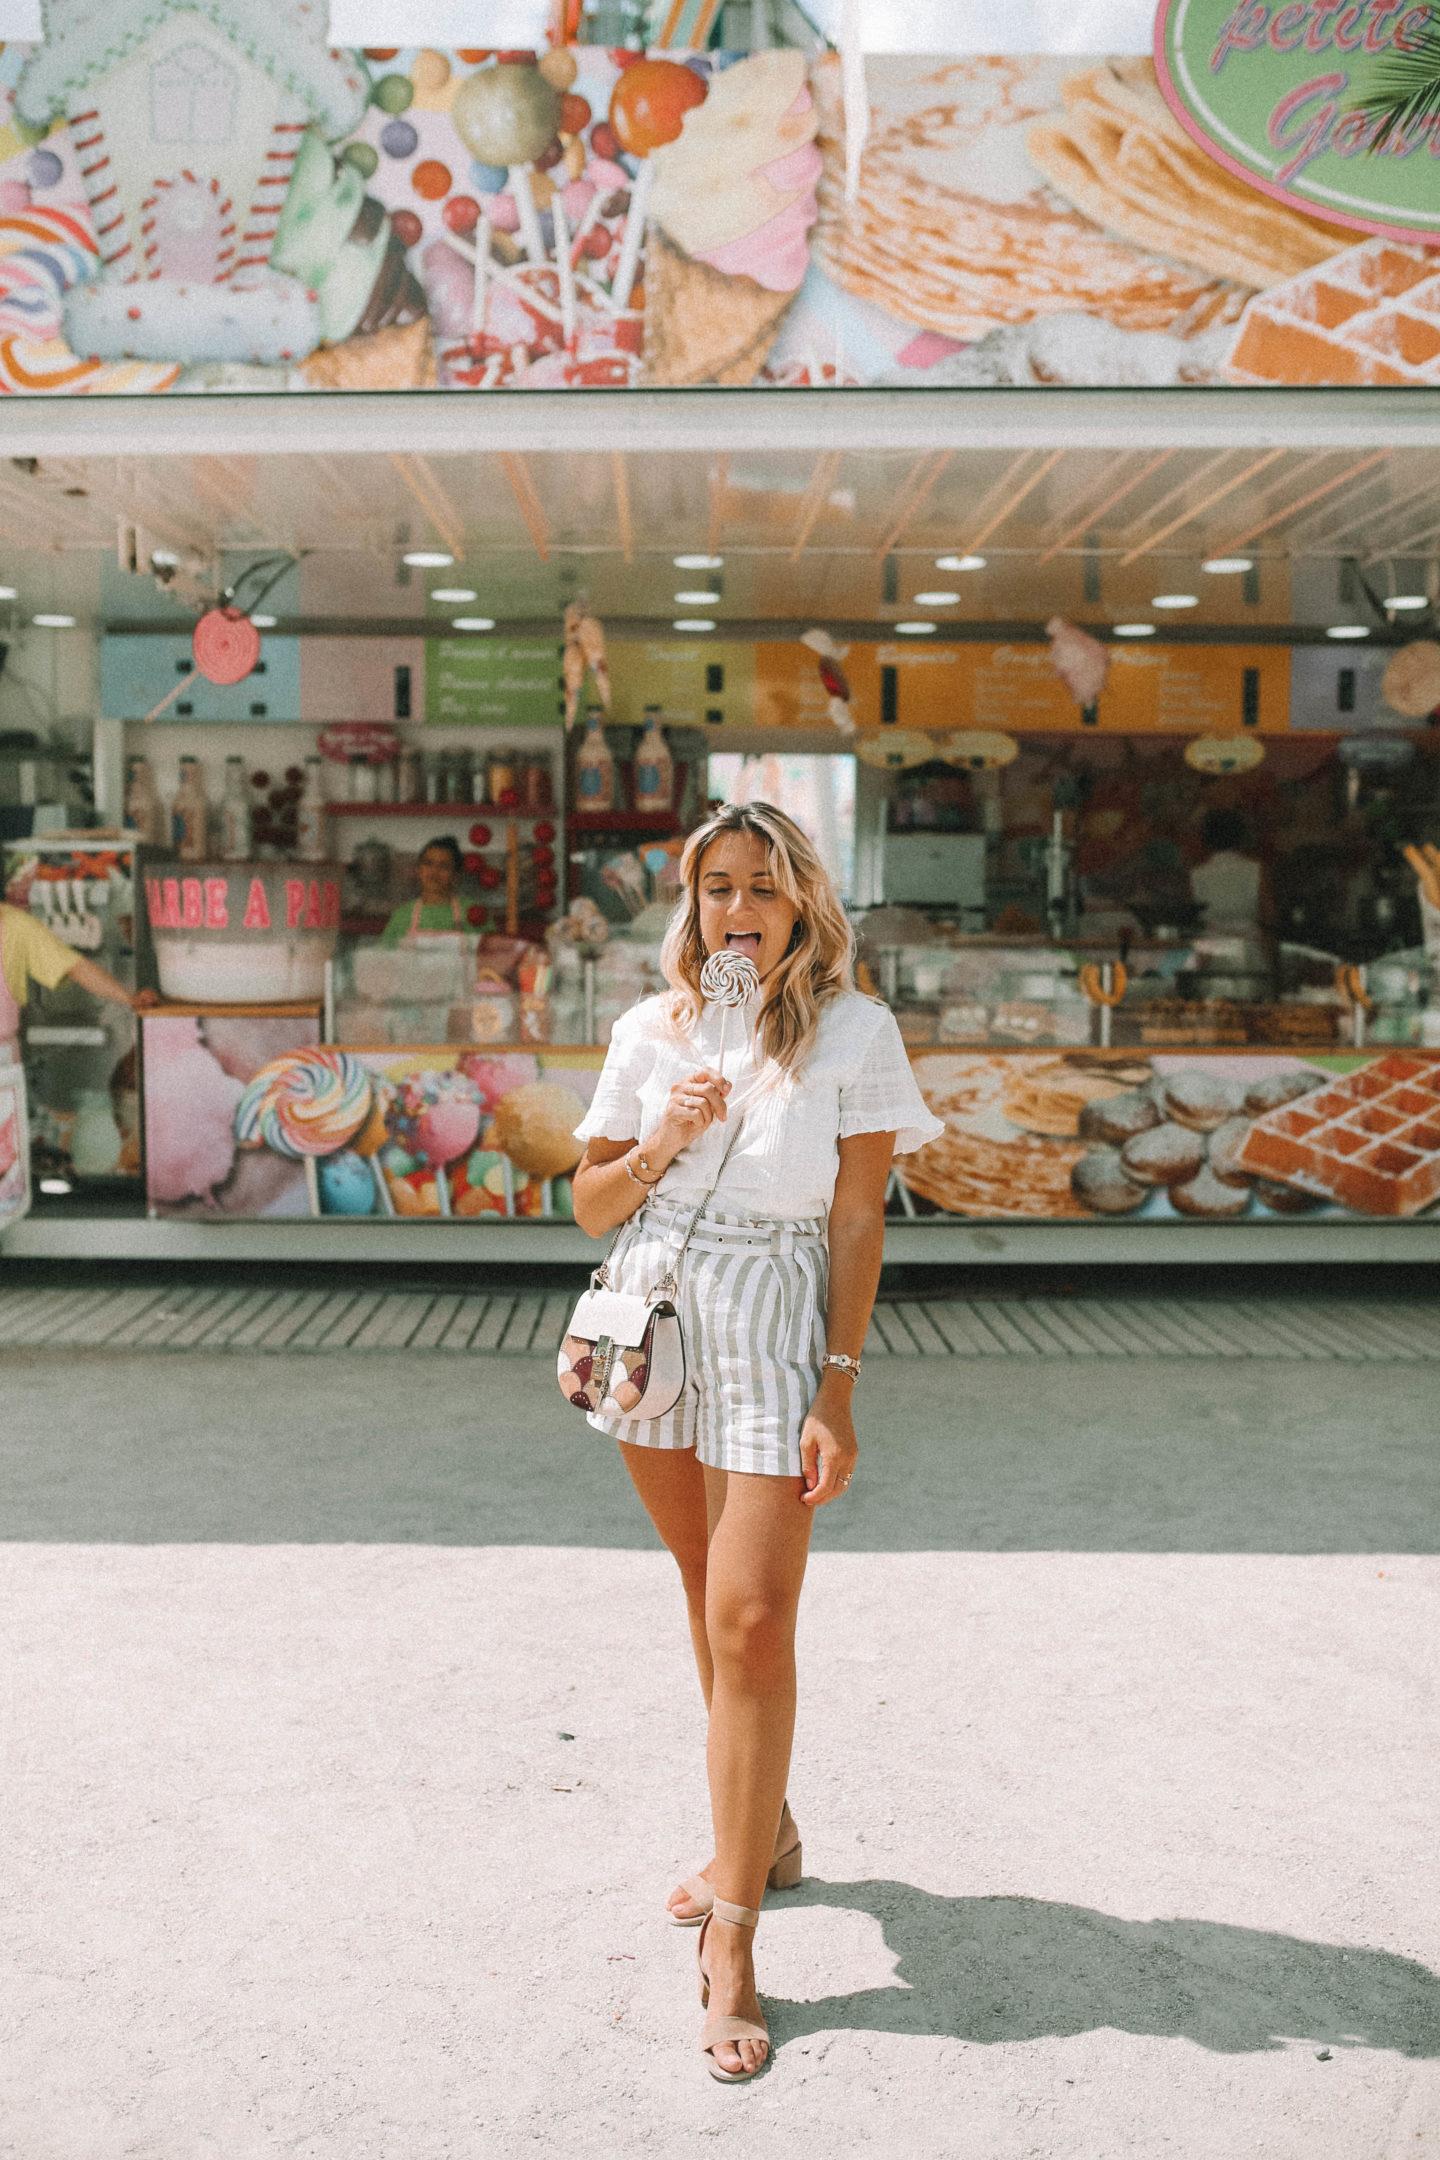 Sac Drew Chloé - Blondie Baby blog mode et voyages Paris